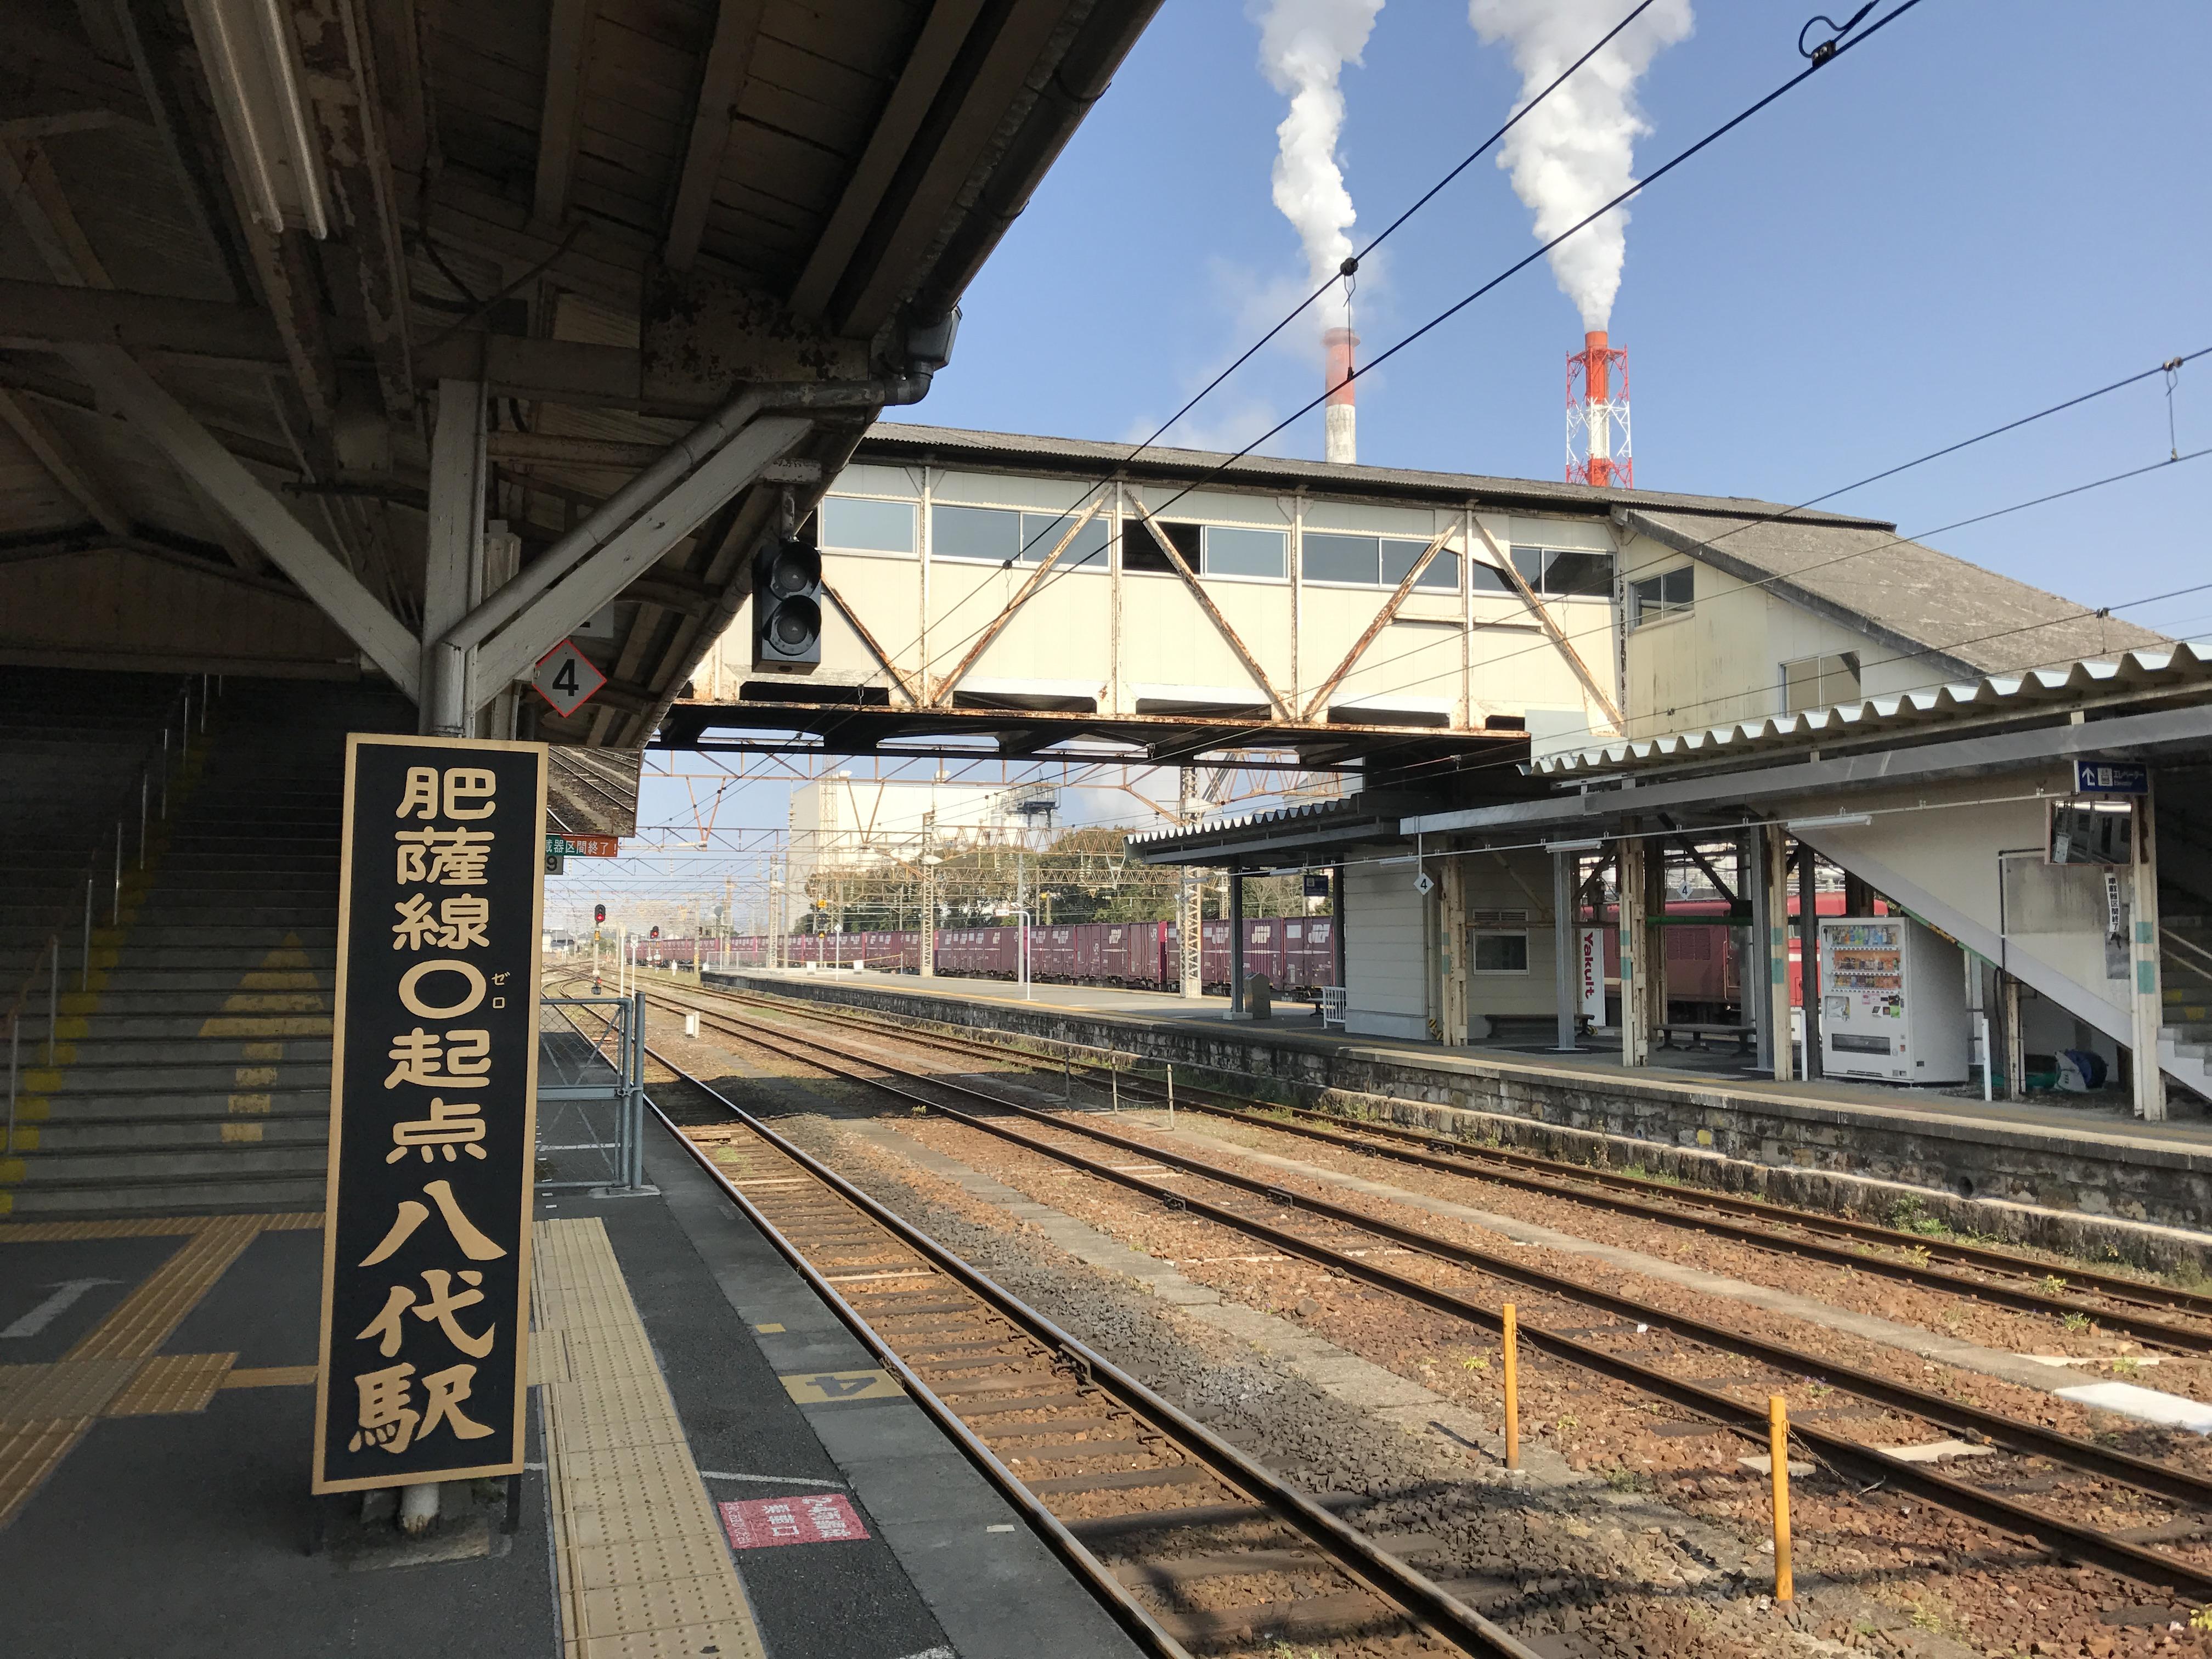 https://upload.wikimedia.org/wikipedia/commons/4/40/Platform_of_Yatsushiro_Station_%28JR%29_2.jpg